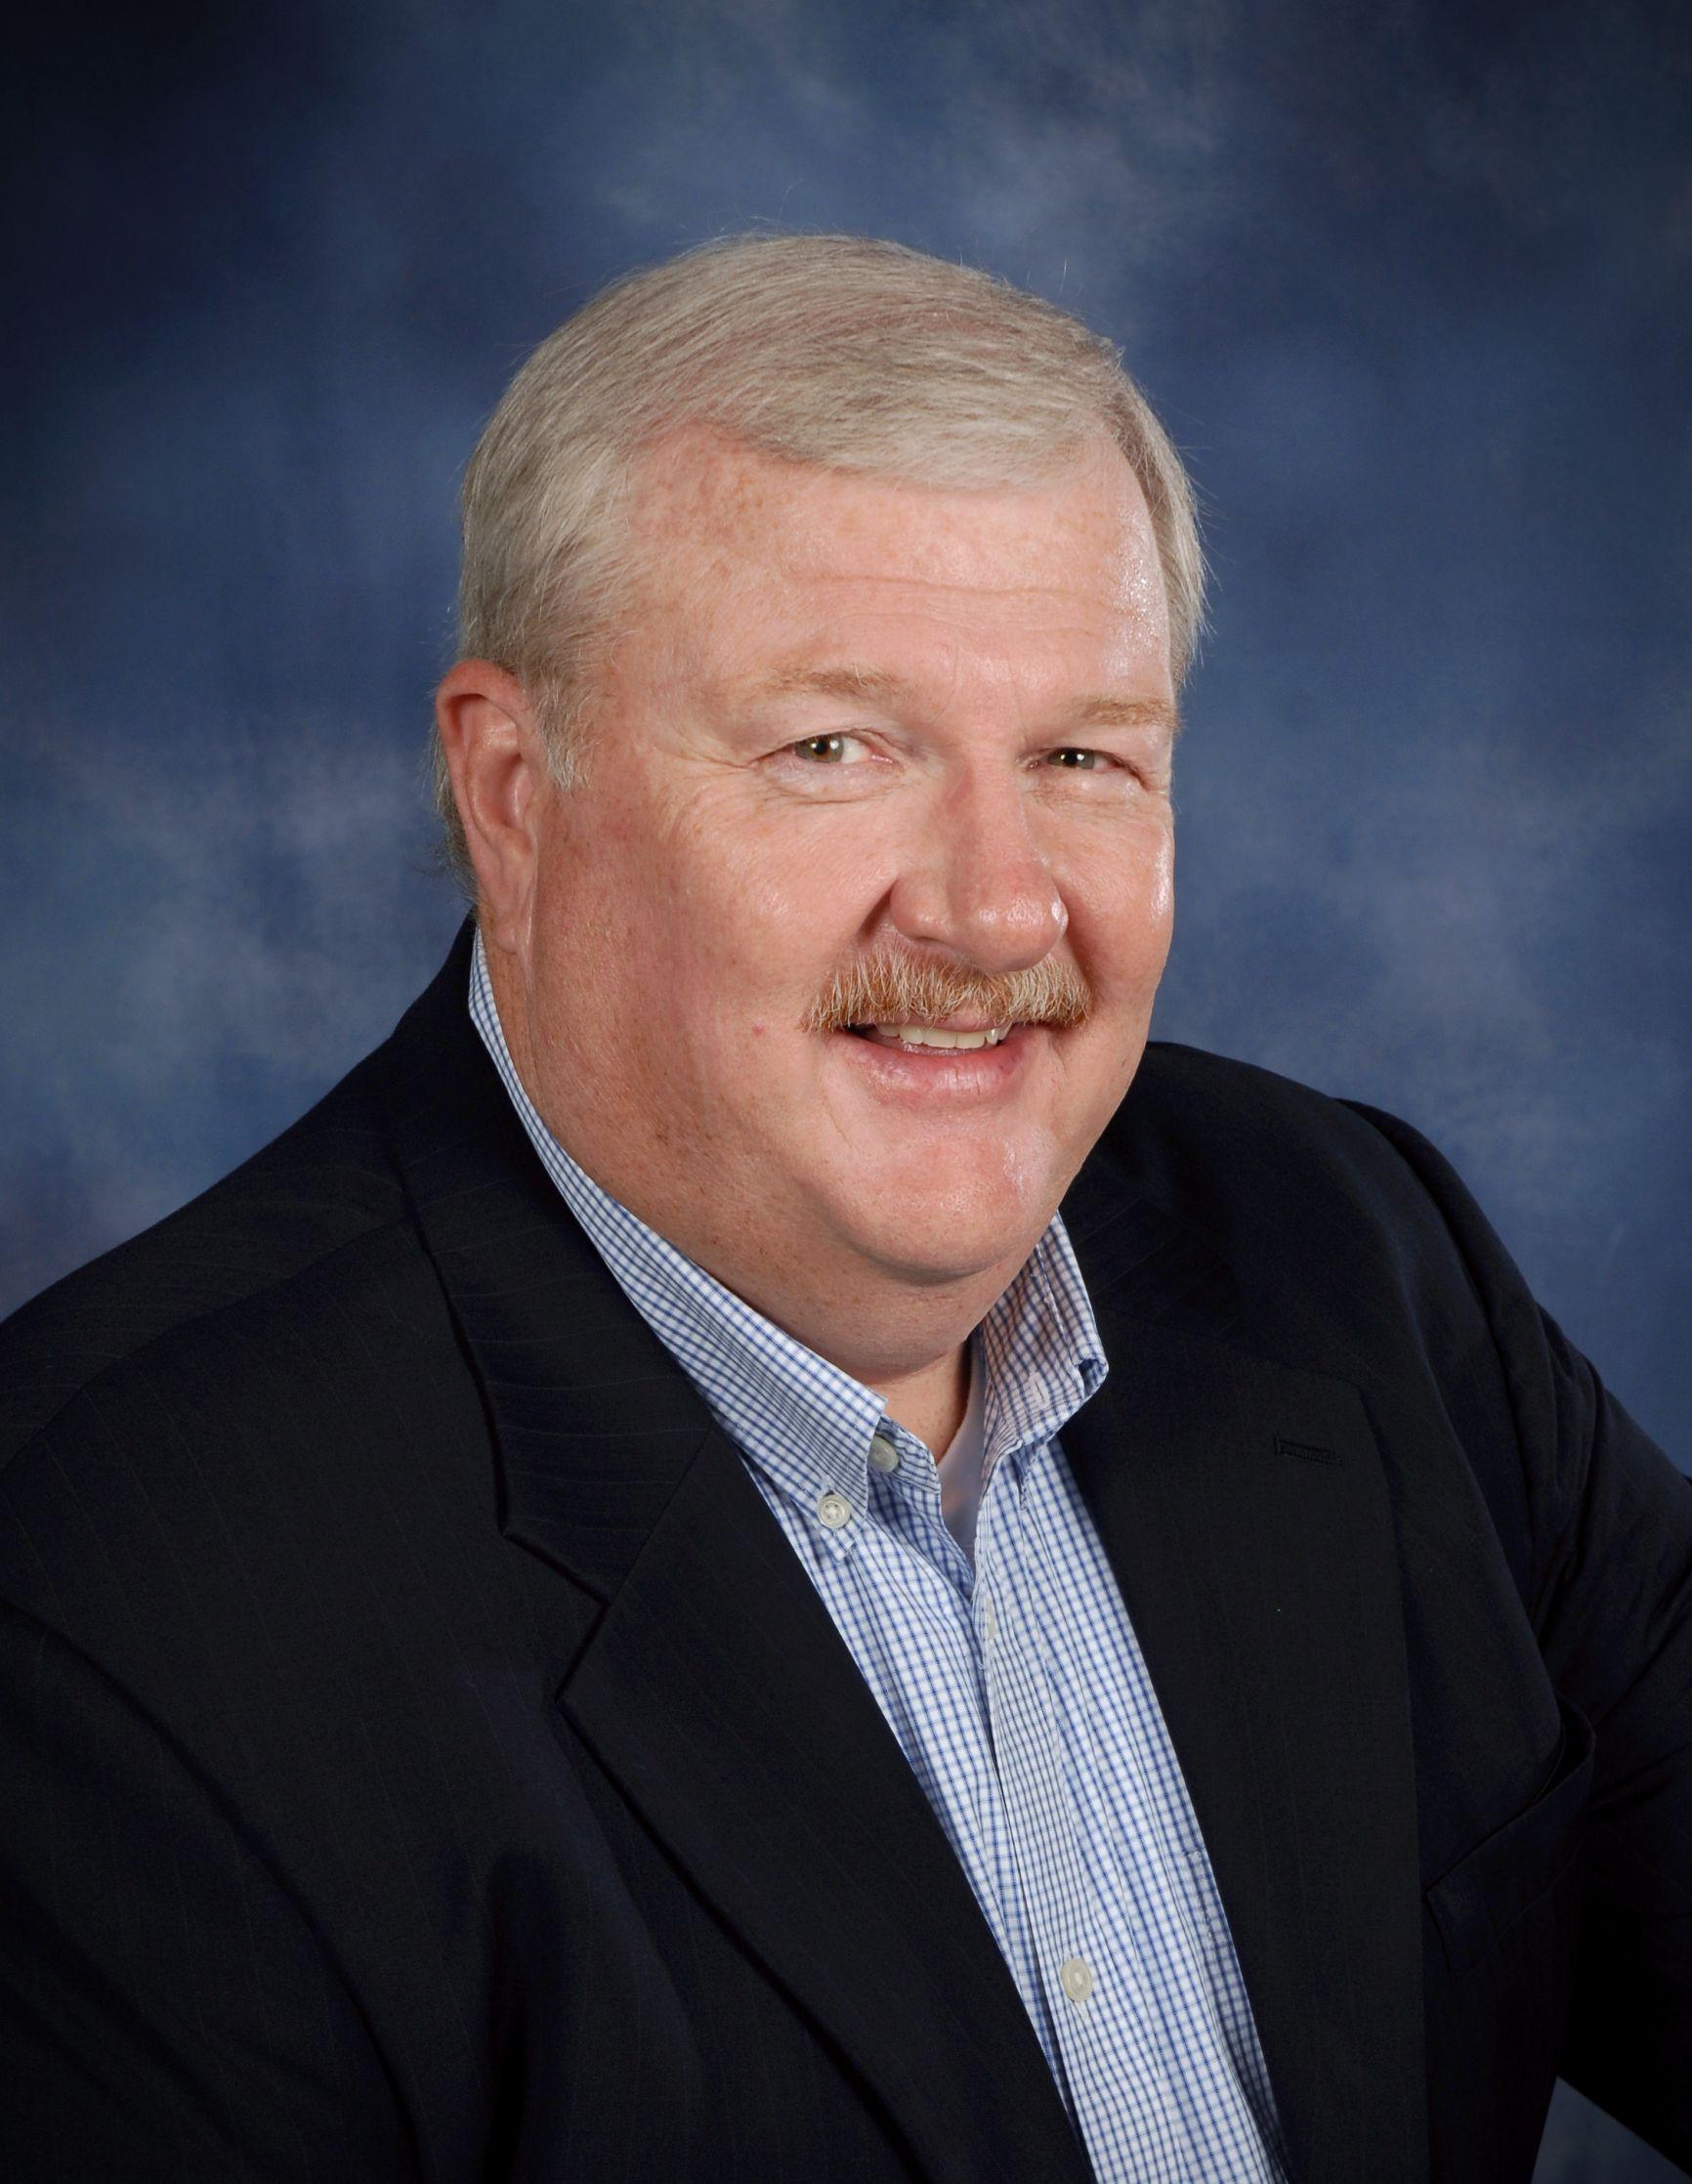 Brian Gareau - Business Culture Expert, Speaker and Consultant